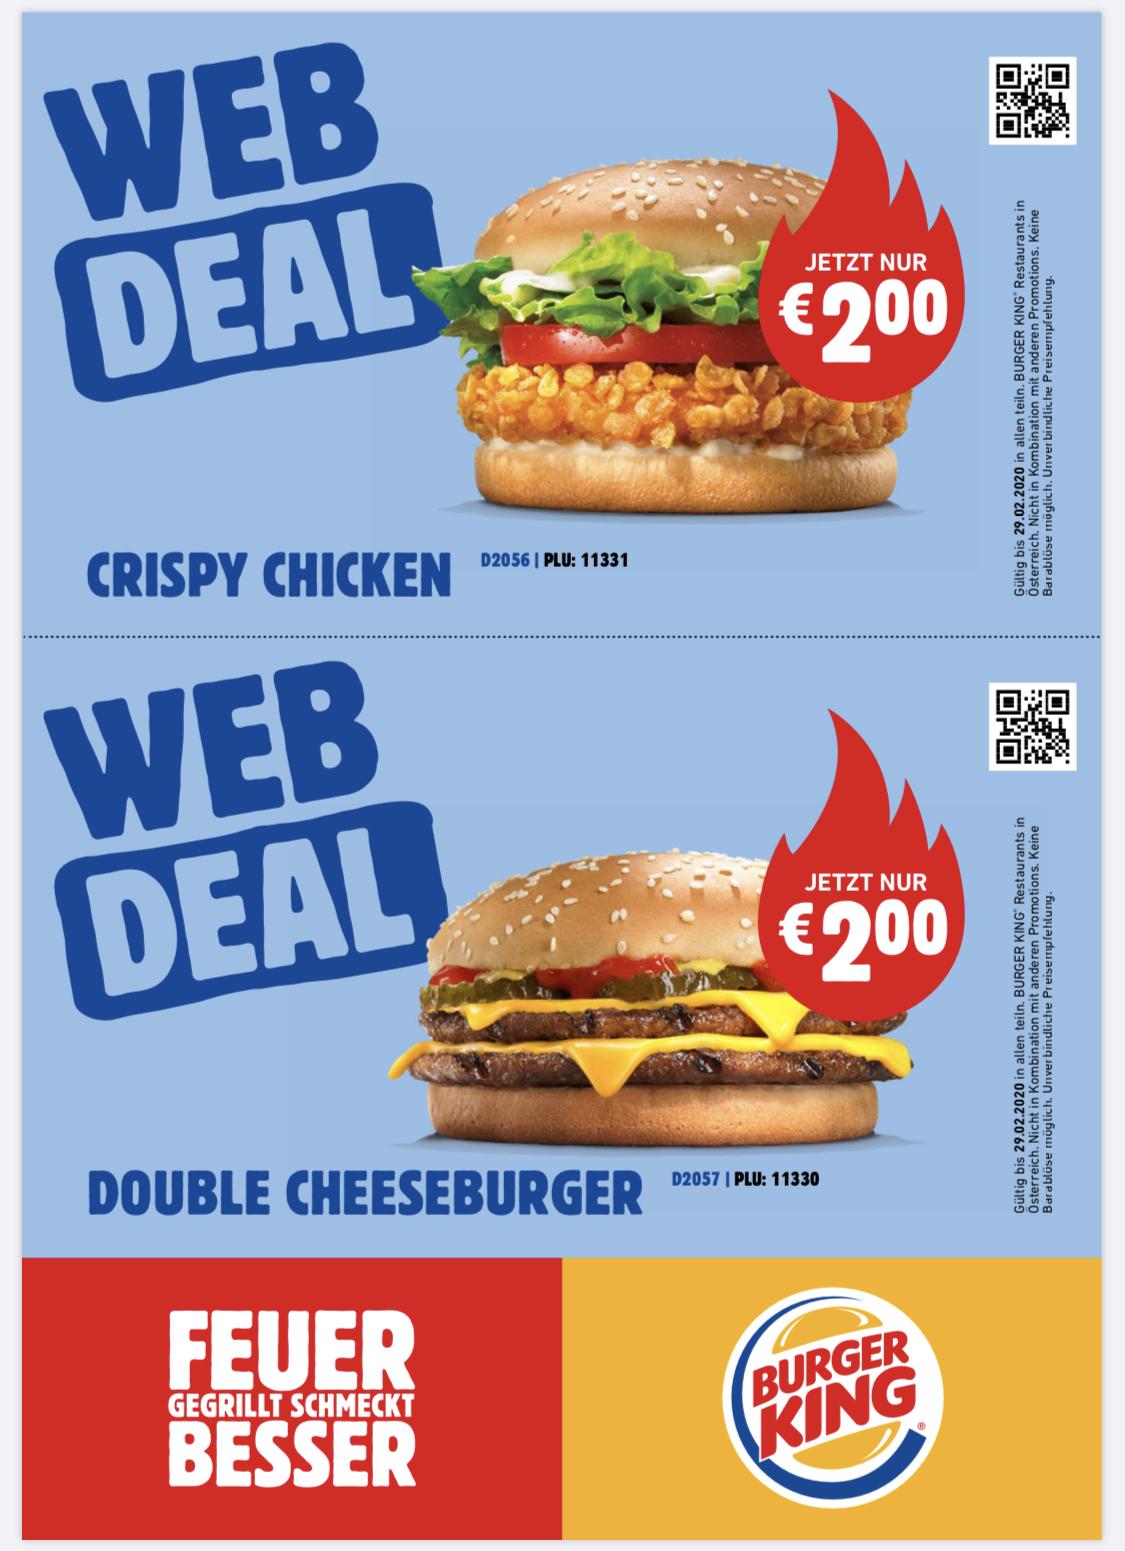 burger king spielzeug aktuell 2020